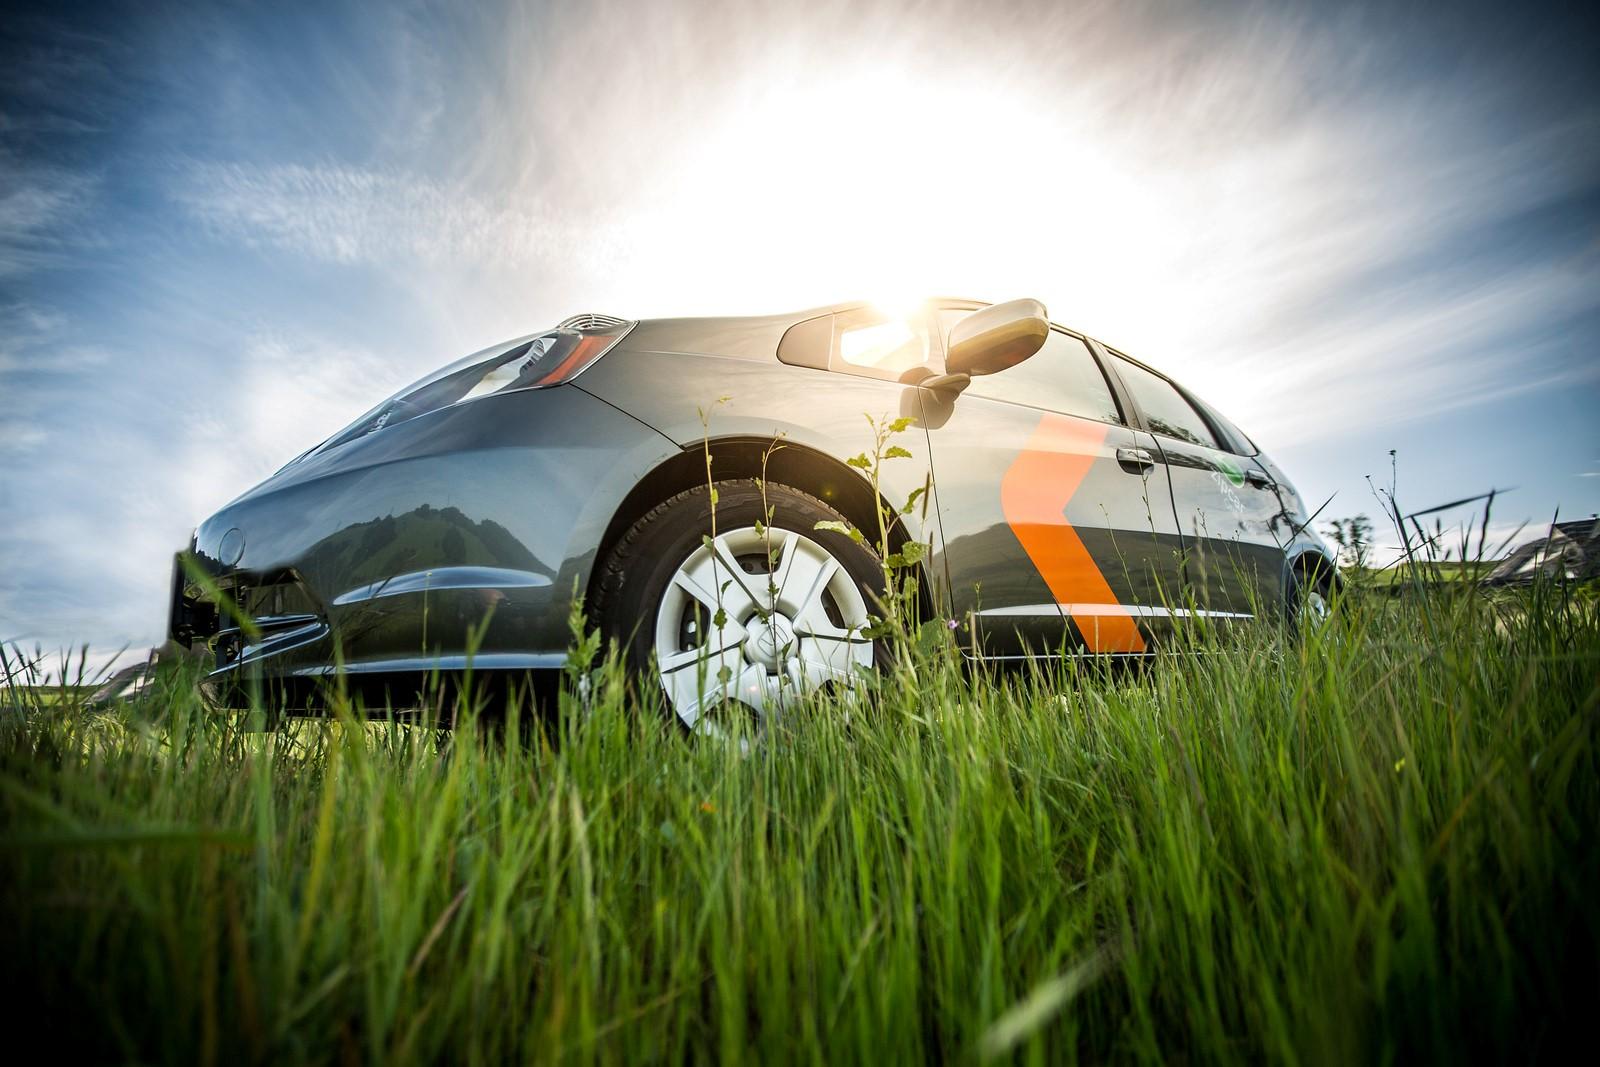 drive  honda fit  zipcars  oneway car sharing service